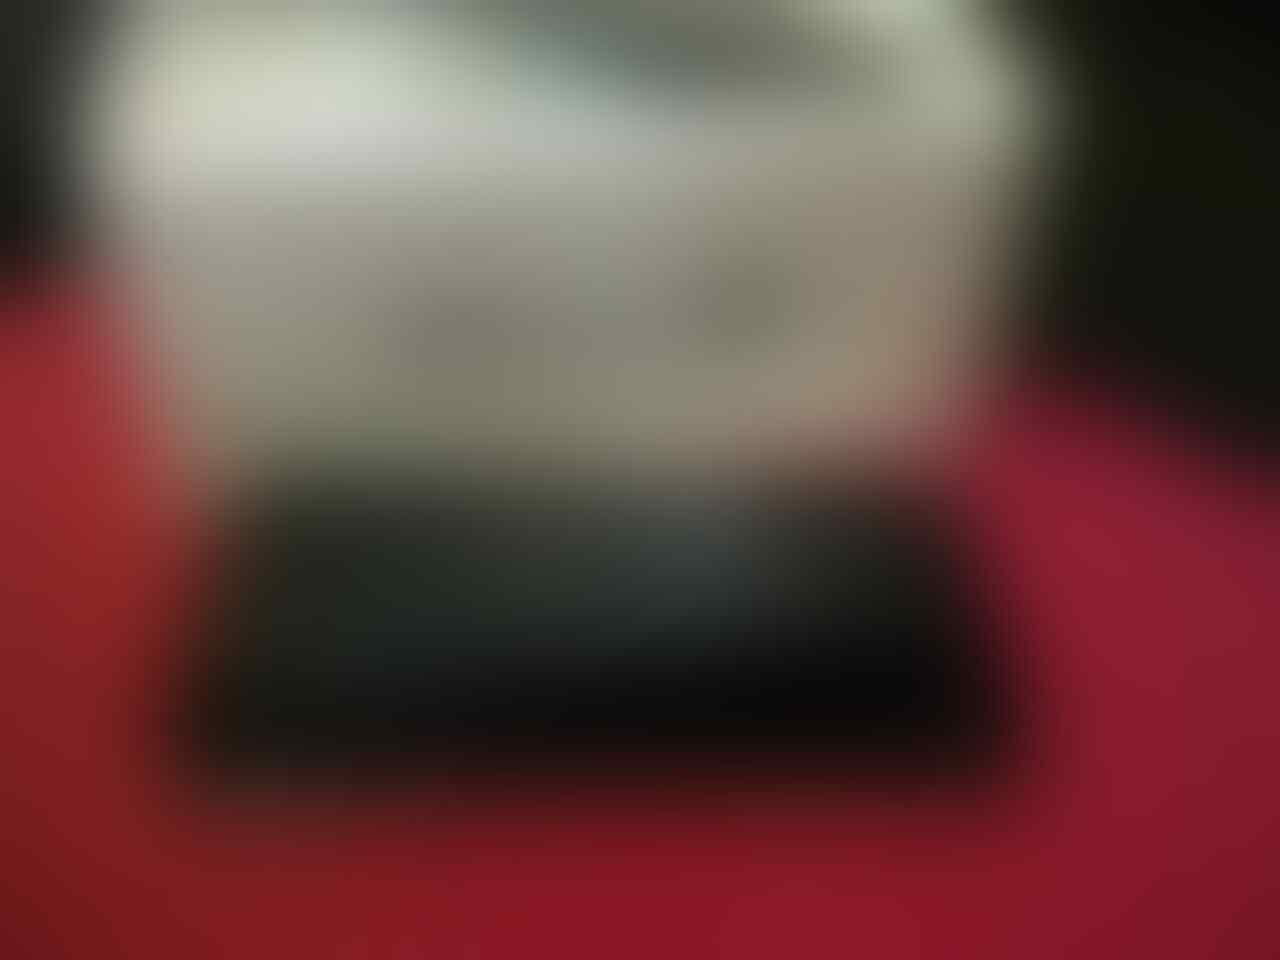 WTS iphone 4s 16GB black kondisi 99%